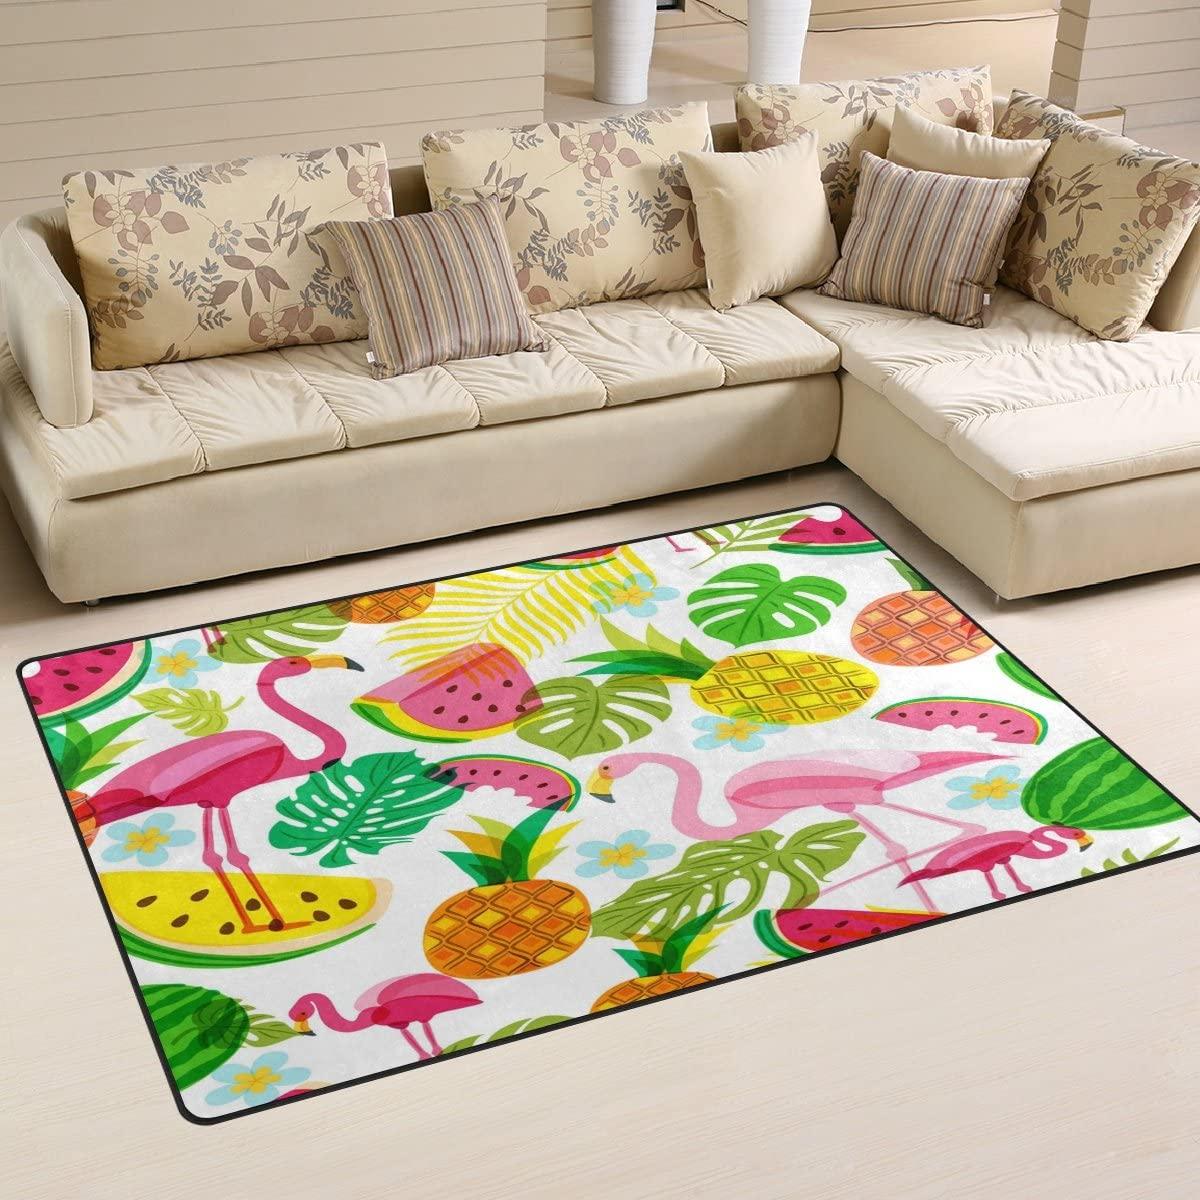 WOZO Watermelon Pineapple Flamingo Bird Palm Area Rug Rugs Non-Slip Floor Mat Doormats Living Dining Room Bedroom Dorm 60 x 39 inches inches Home Decor